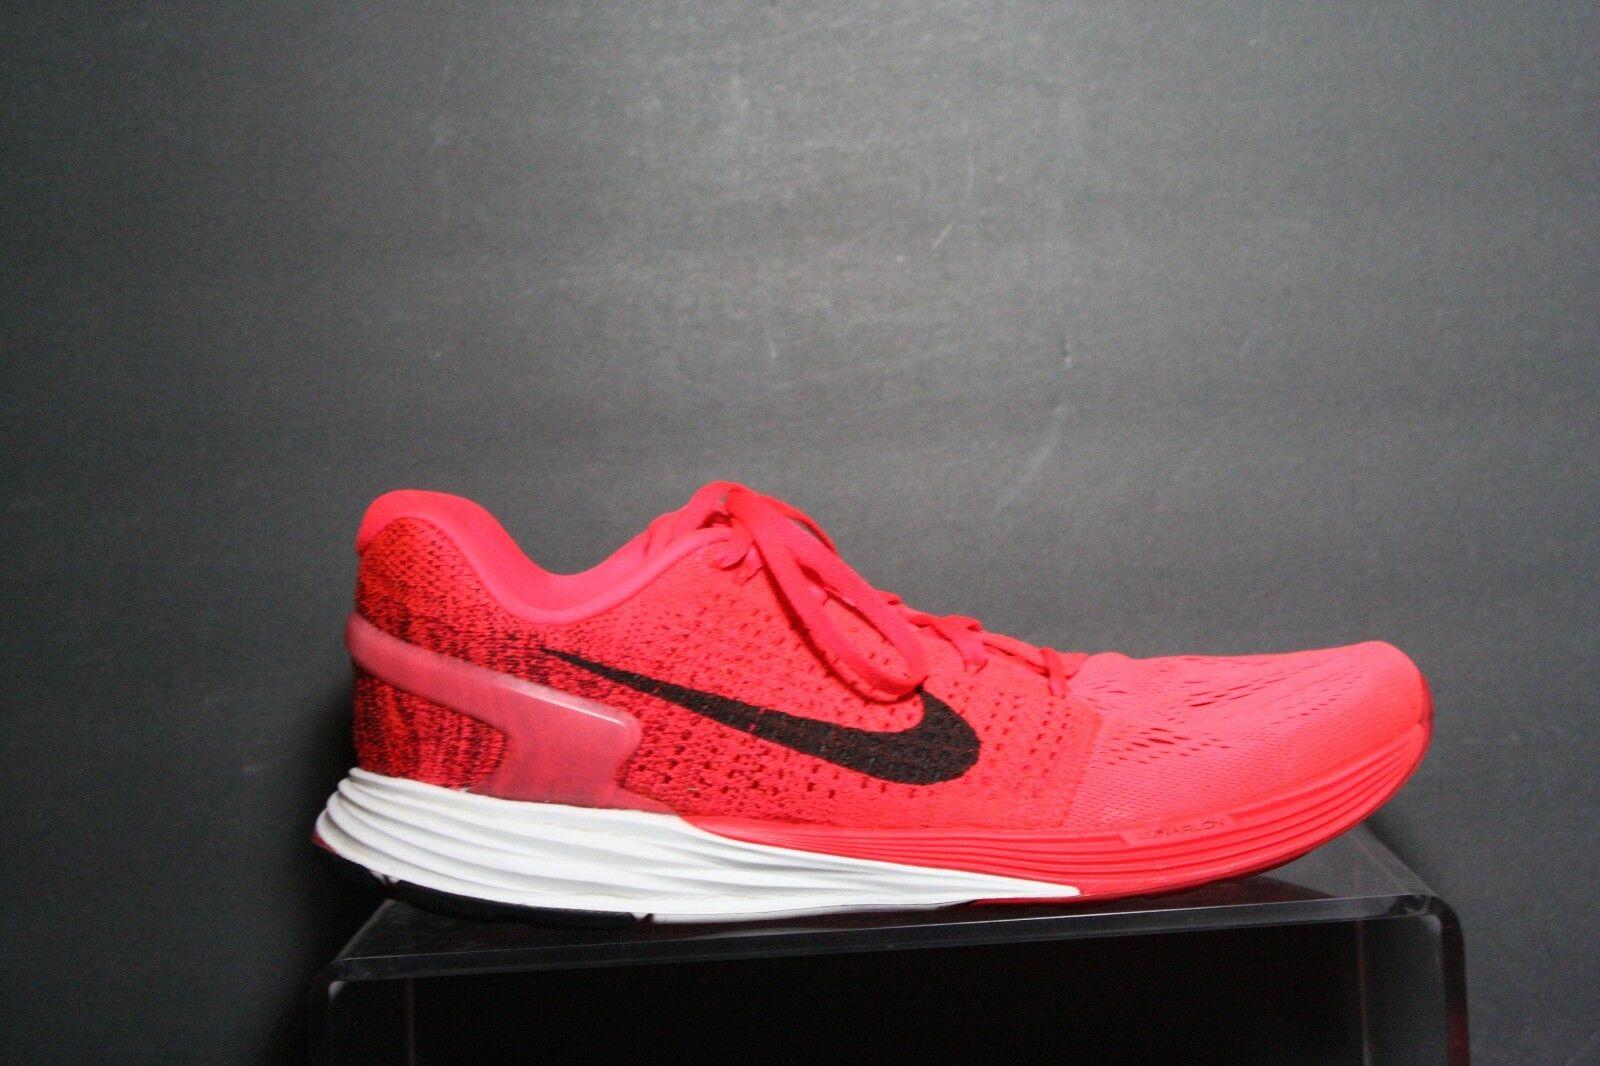 Nike Lunarglide VII 7 Running Sneaker '15 Athletic Multi Citrus Crimson Men 11.5